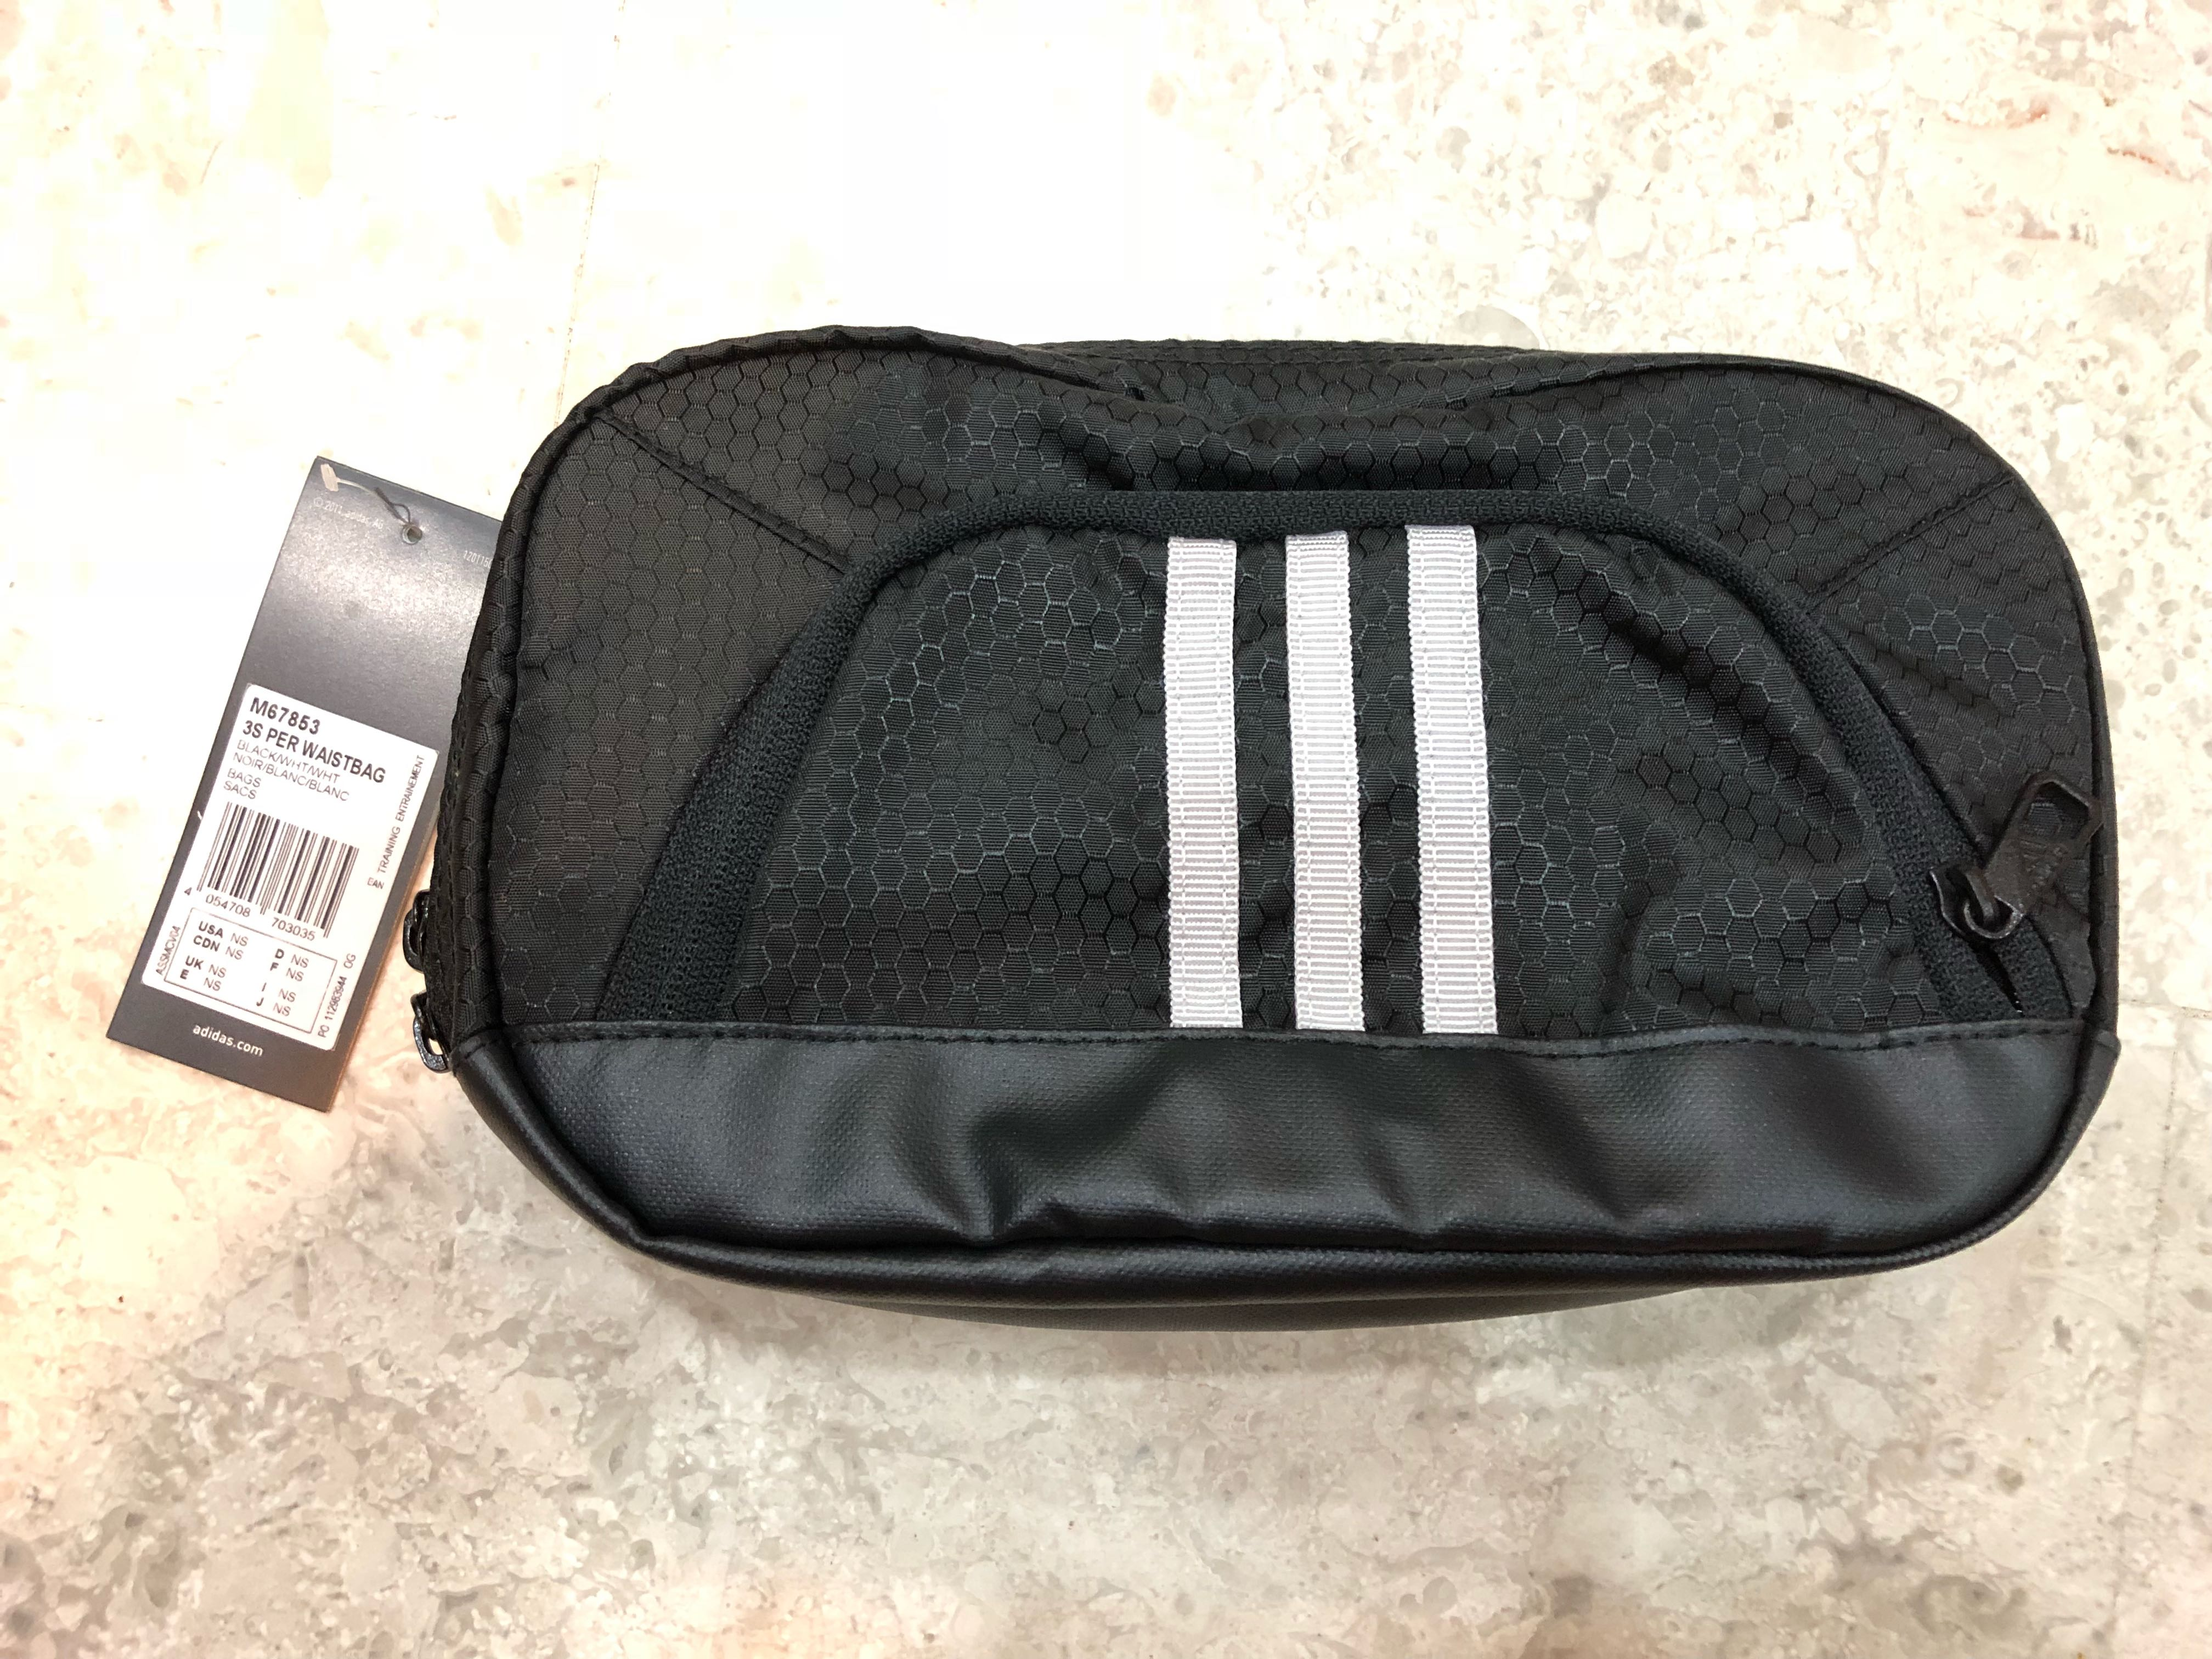 a3a58c4692 Adidas Black Waist Bag